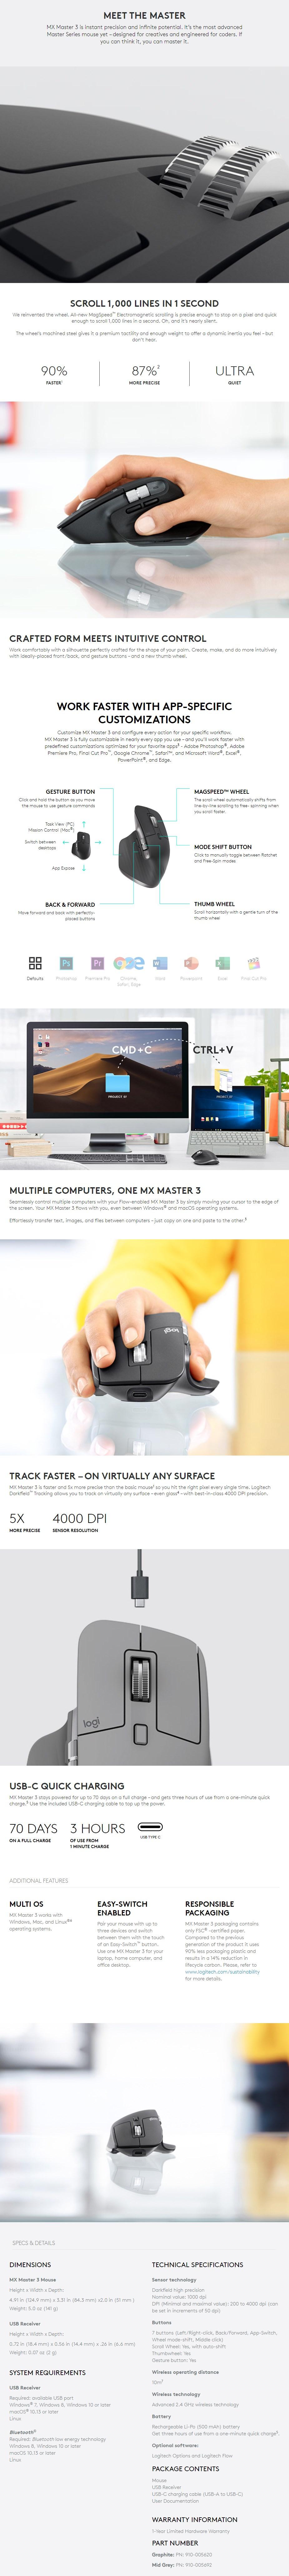 Logitech MX Master 3 Wireless Mouse - Graphite - Desktop Overview 1